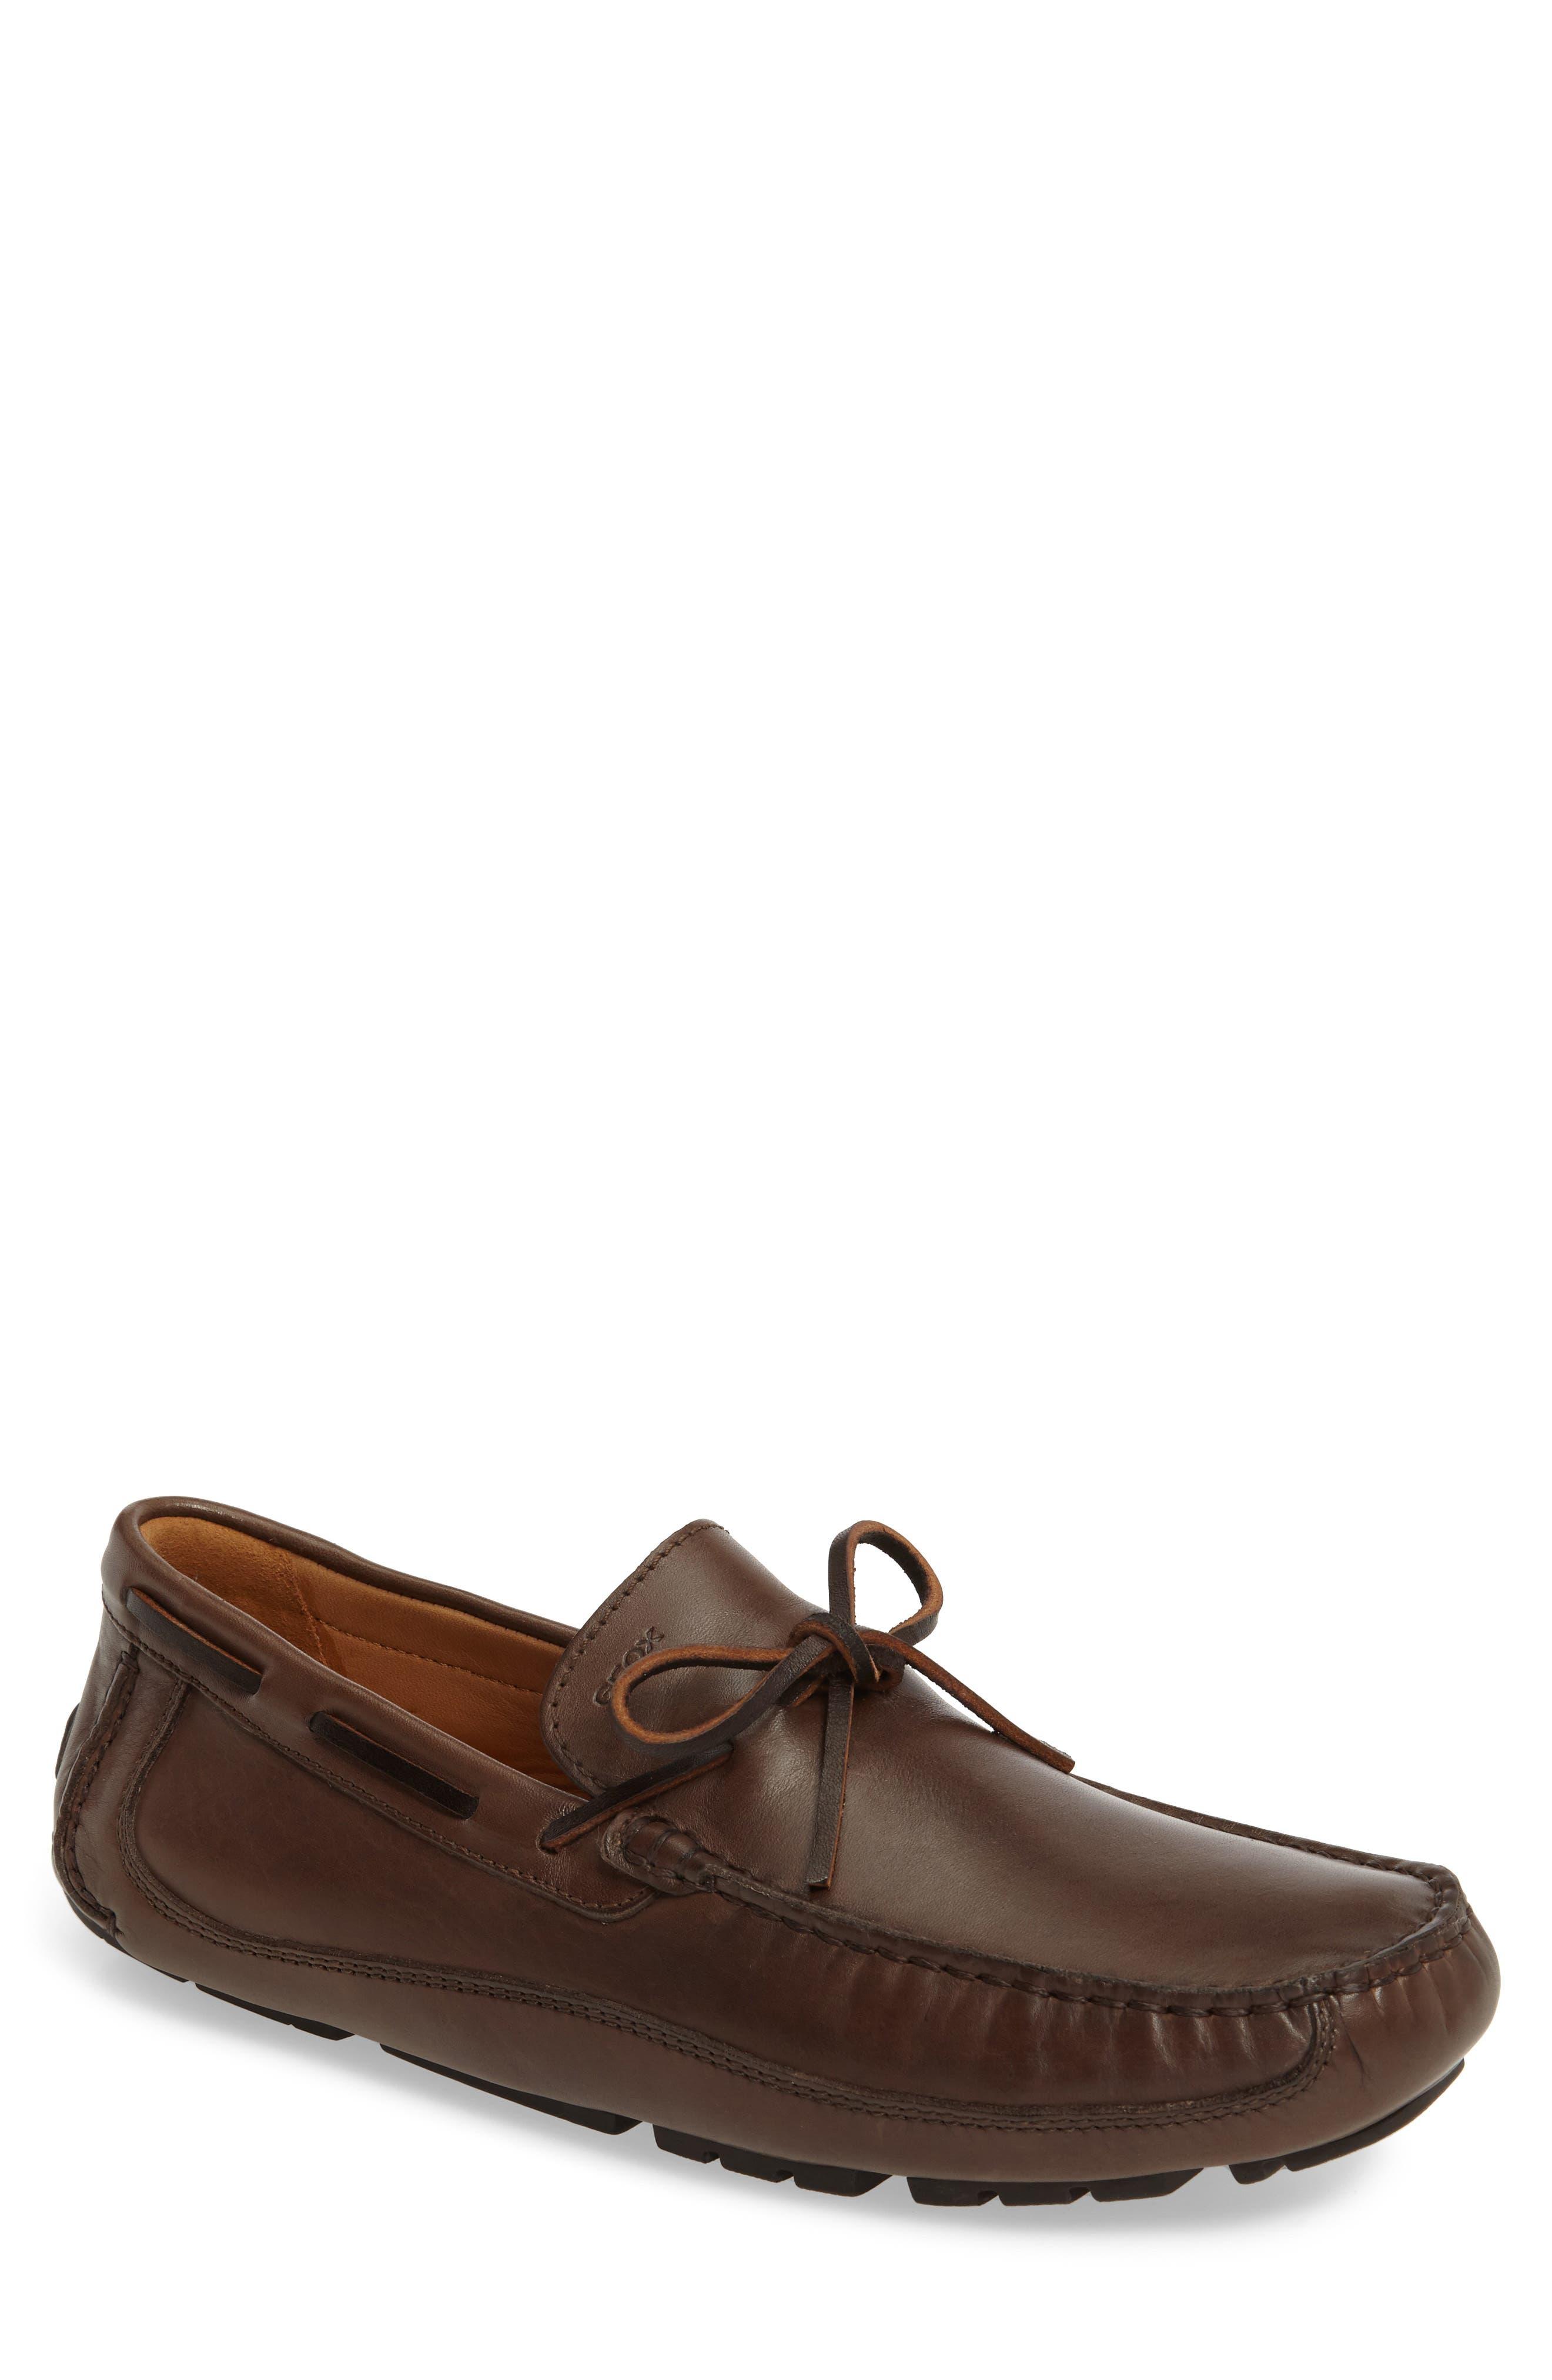 Geox Melbourne 3 Driving Shoe (Men)